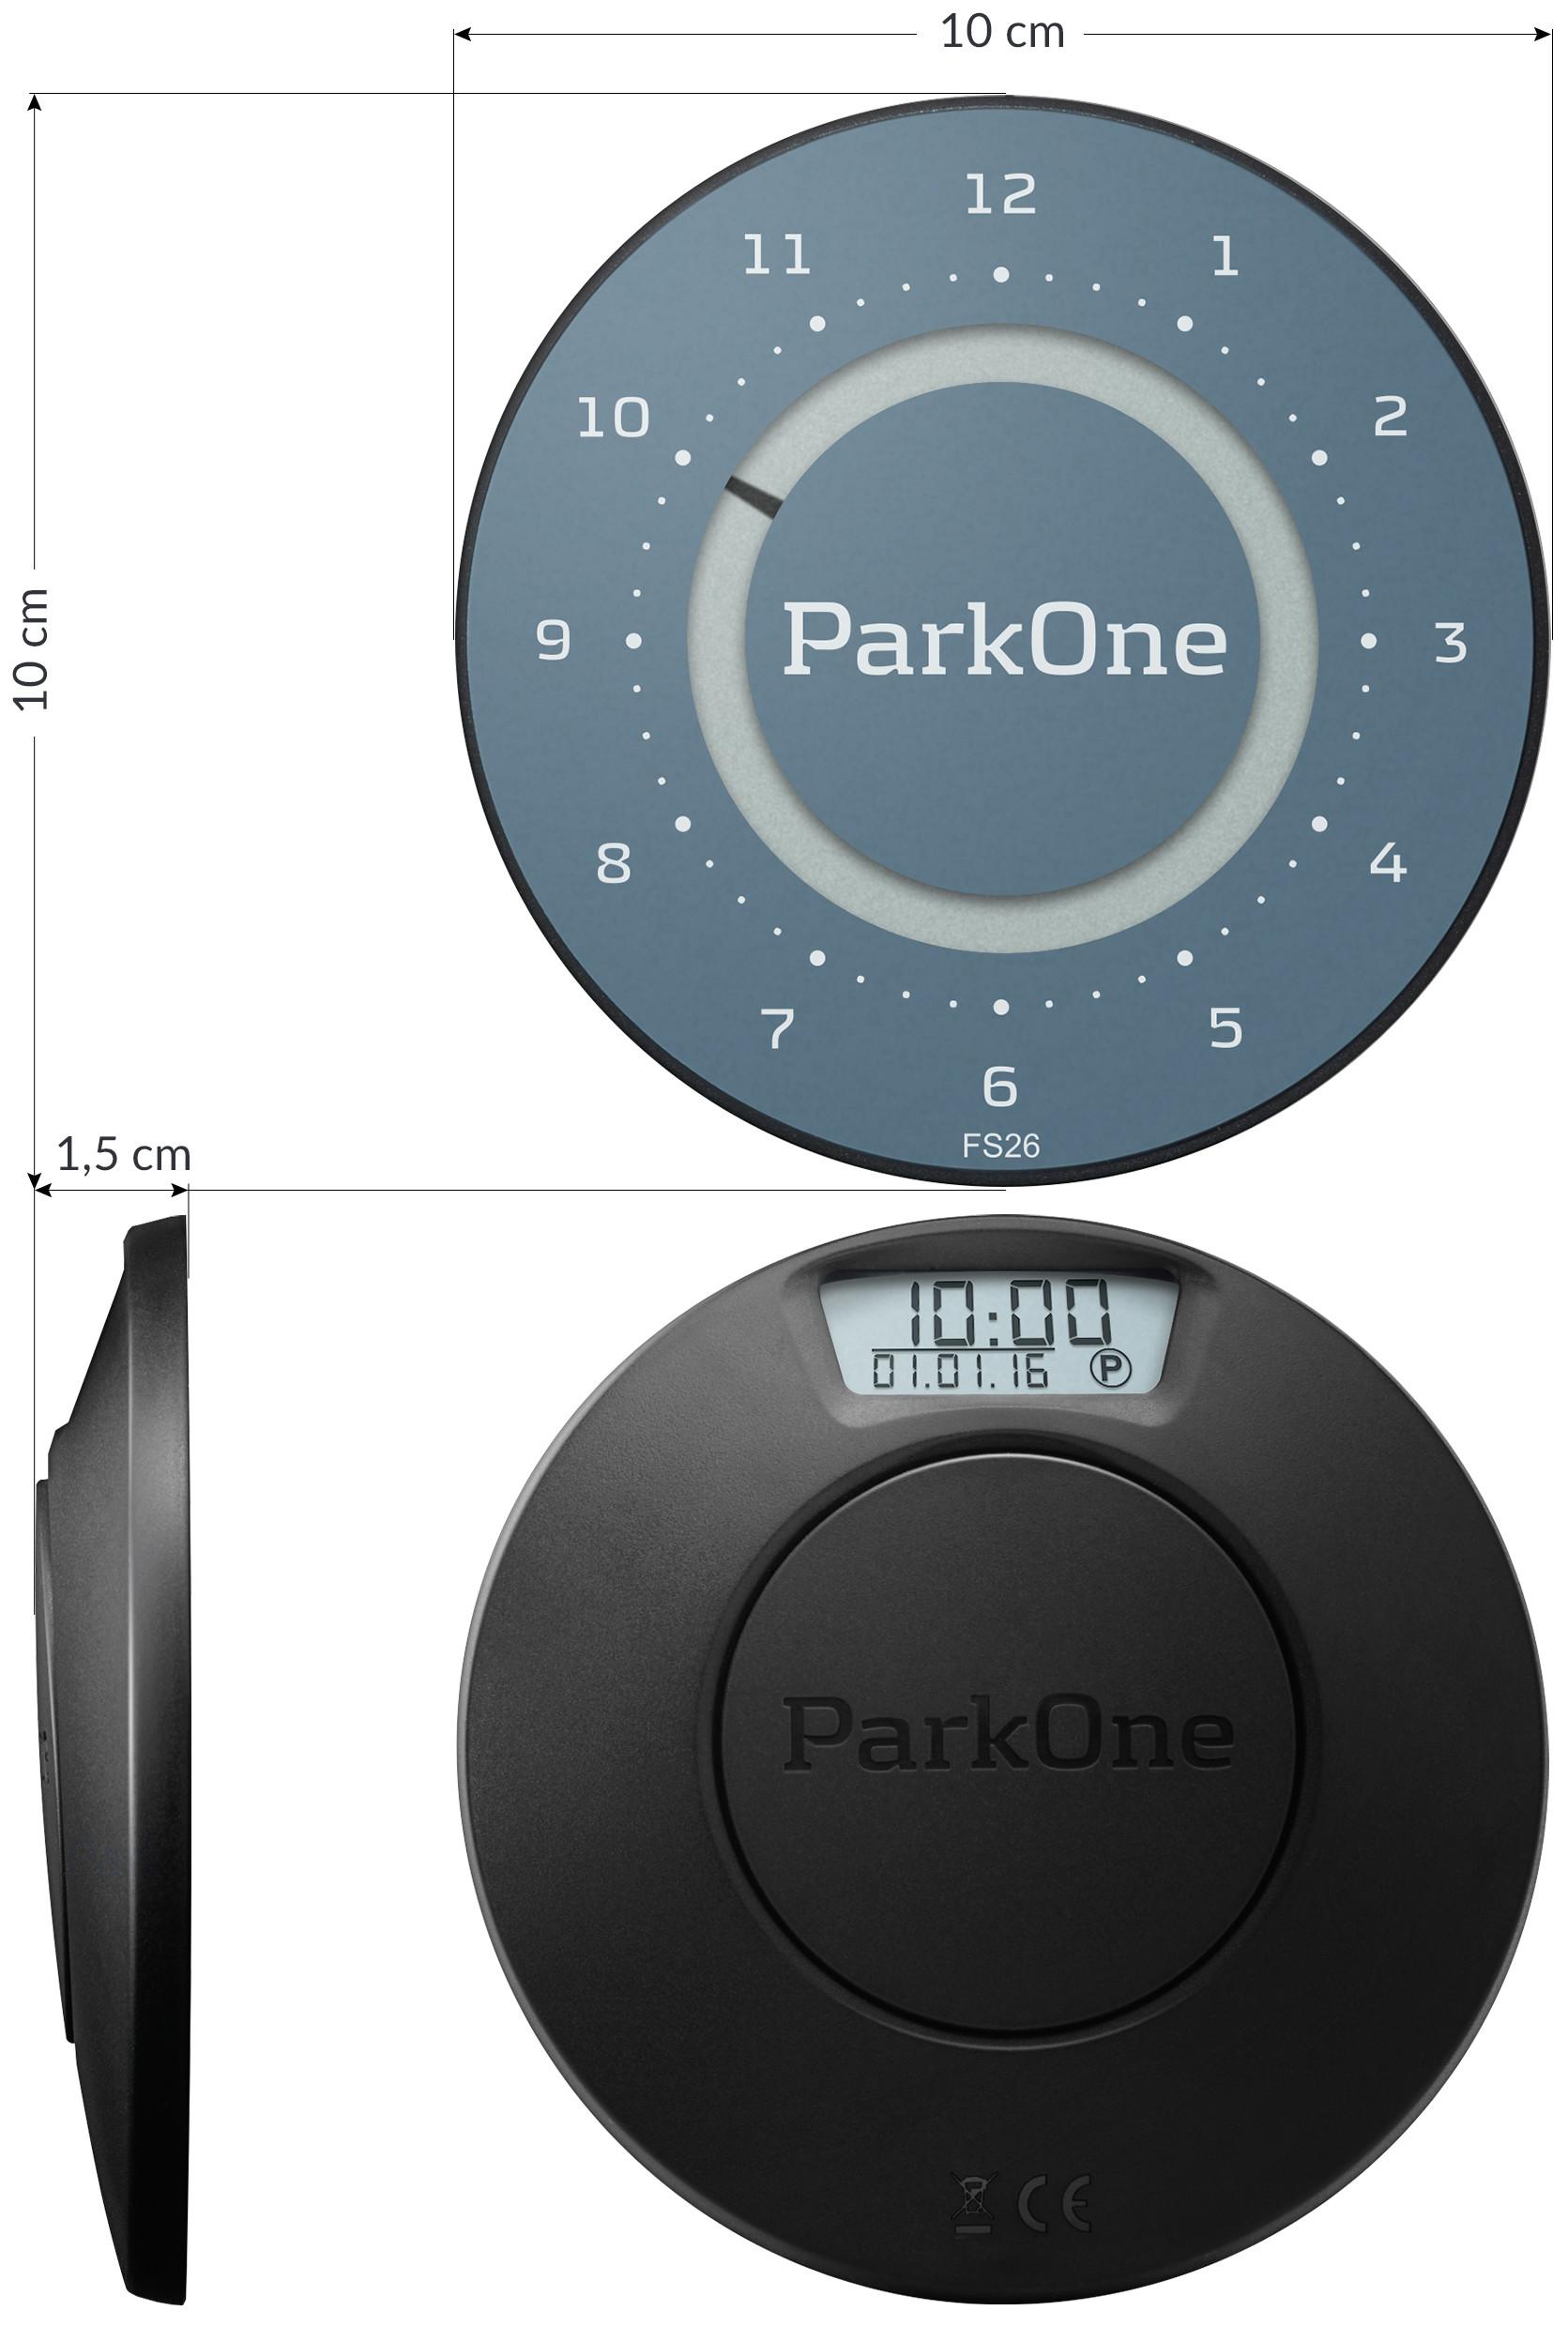 ParkOne 2 dimensions